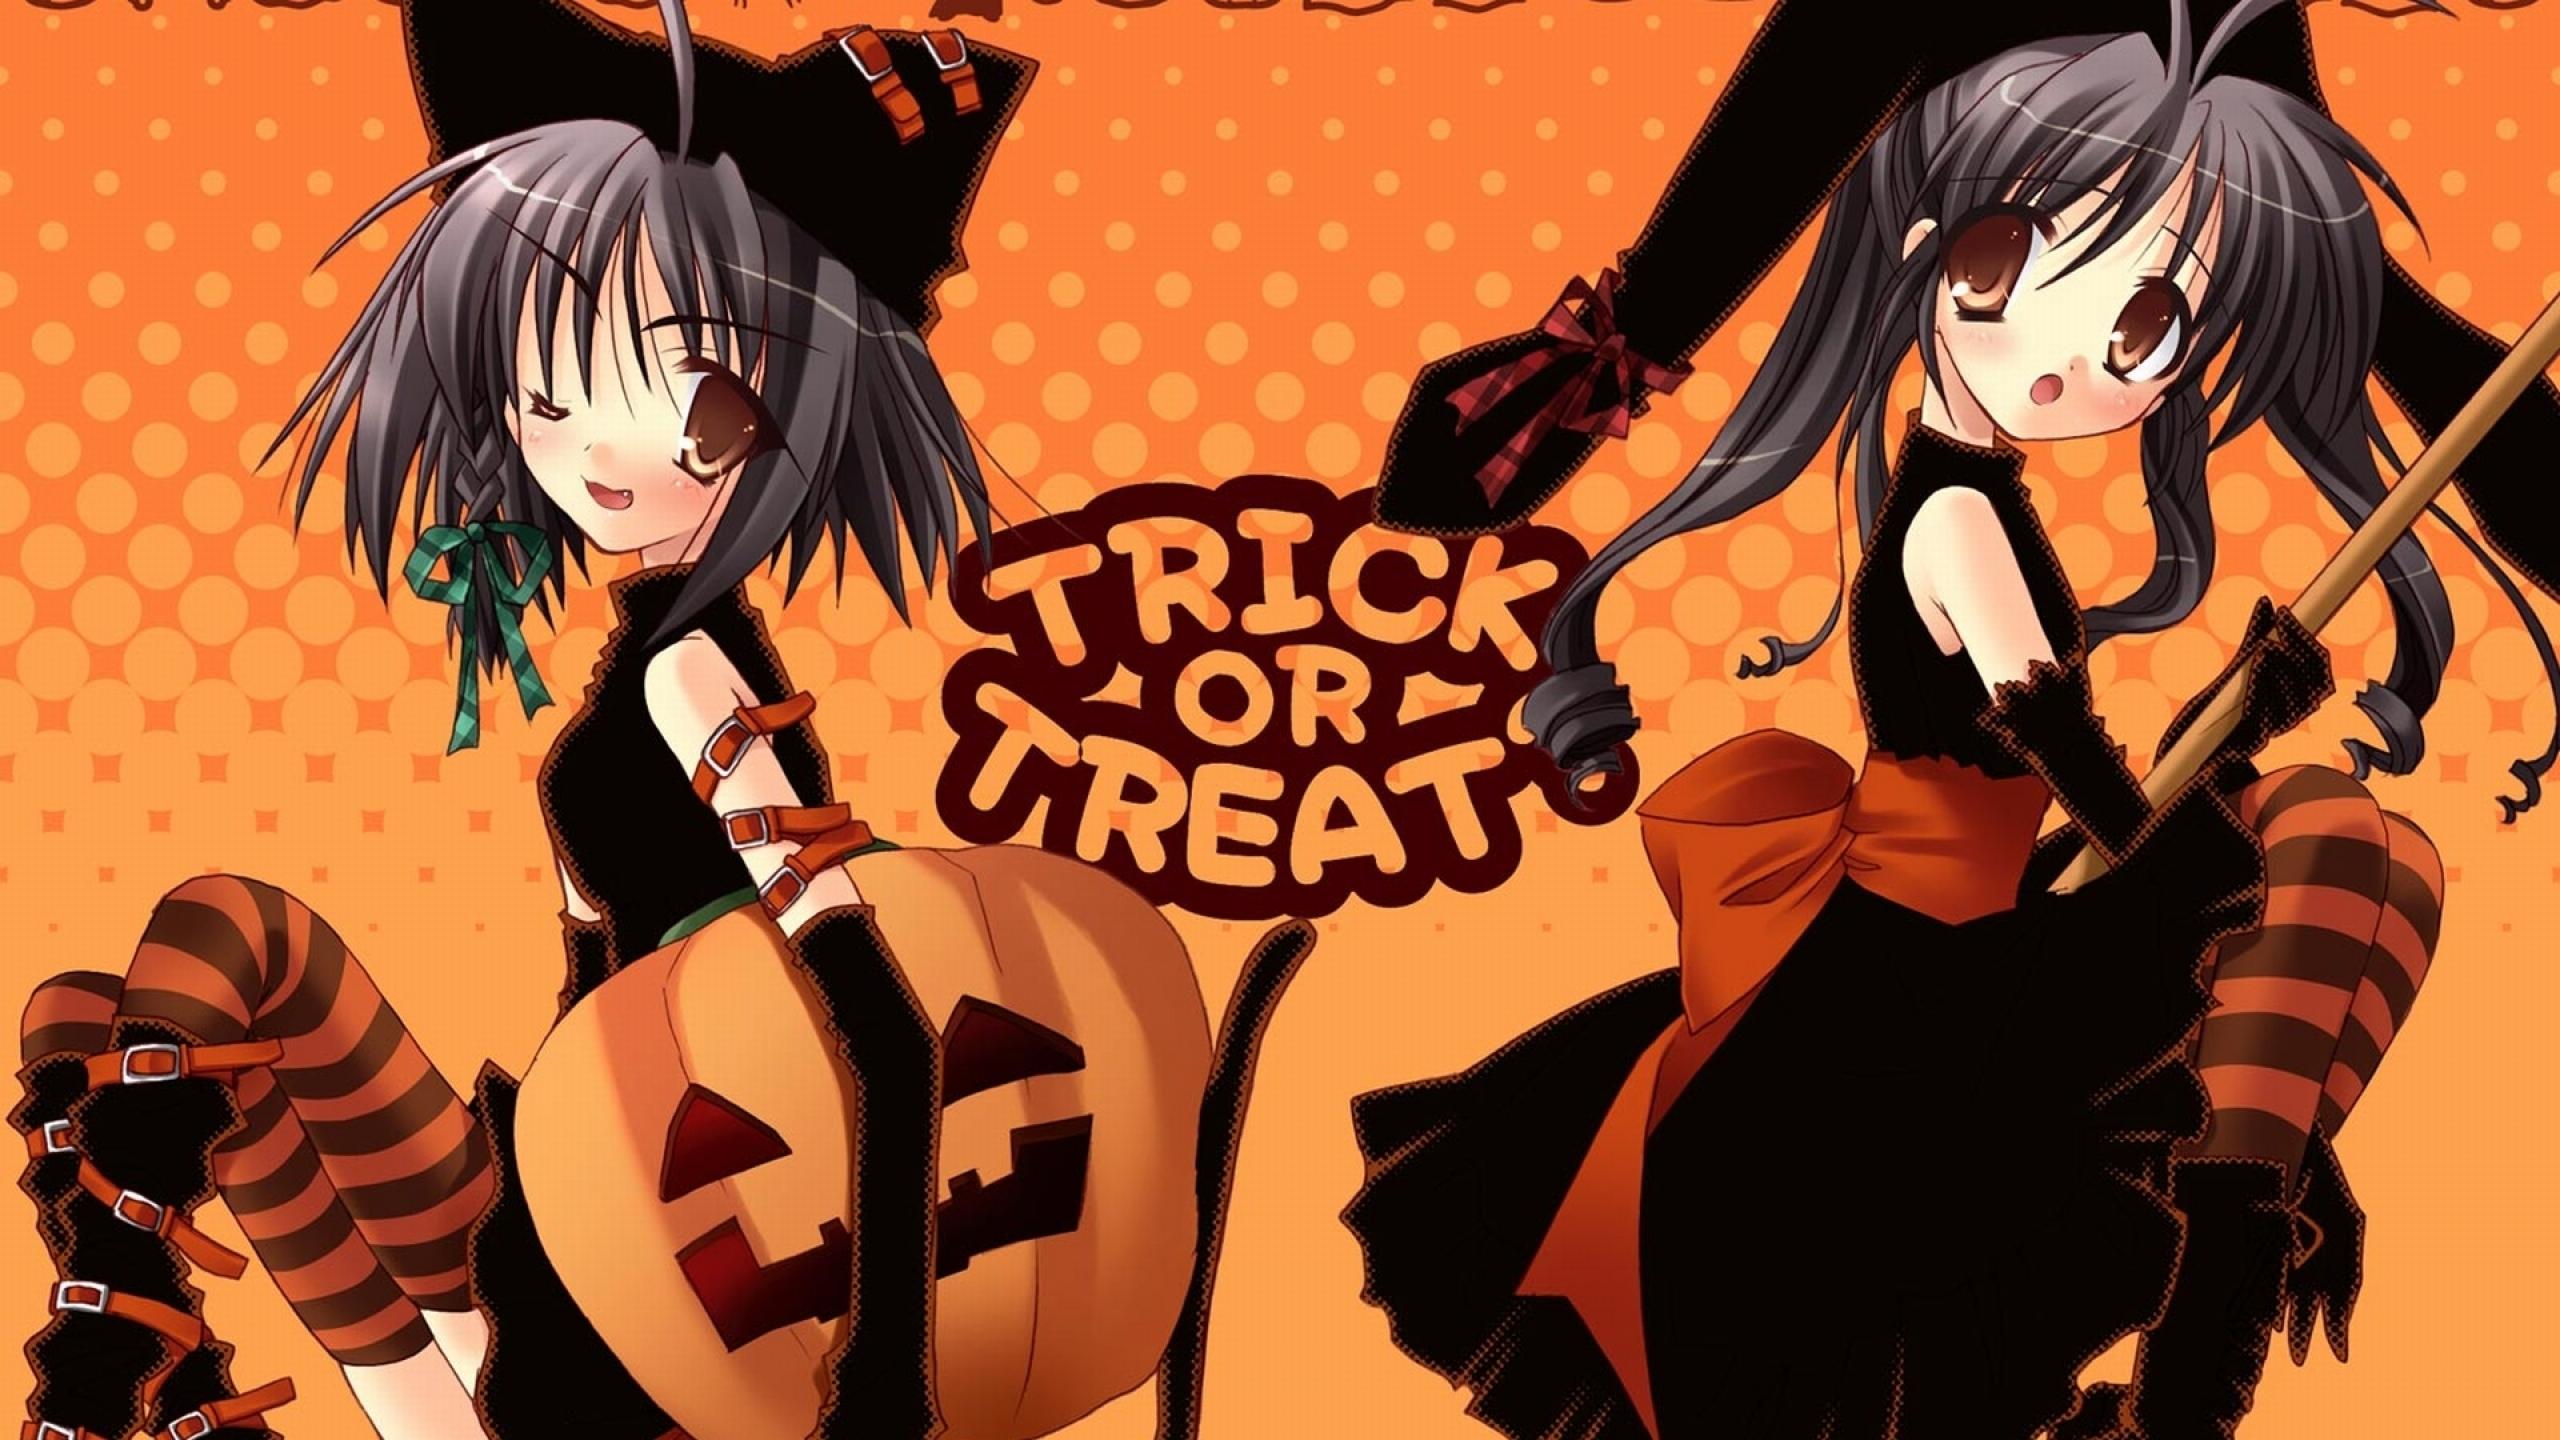 Halloween Anime Girl wallpapers